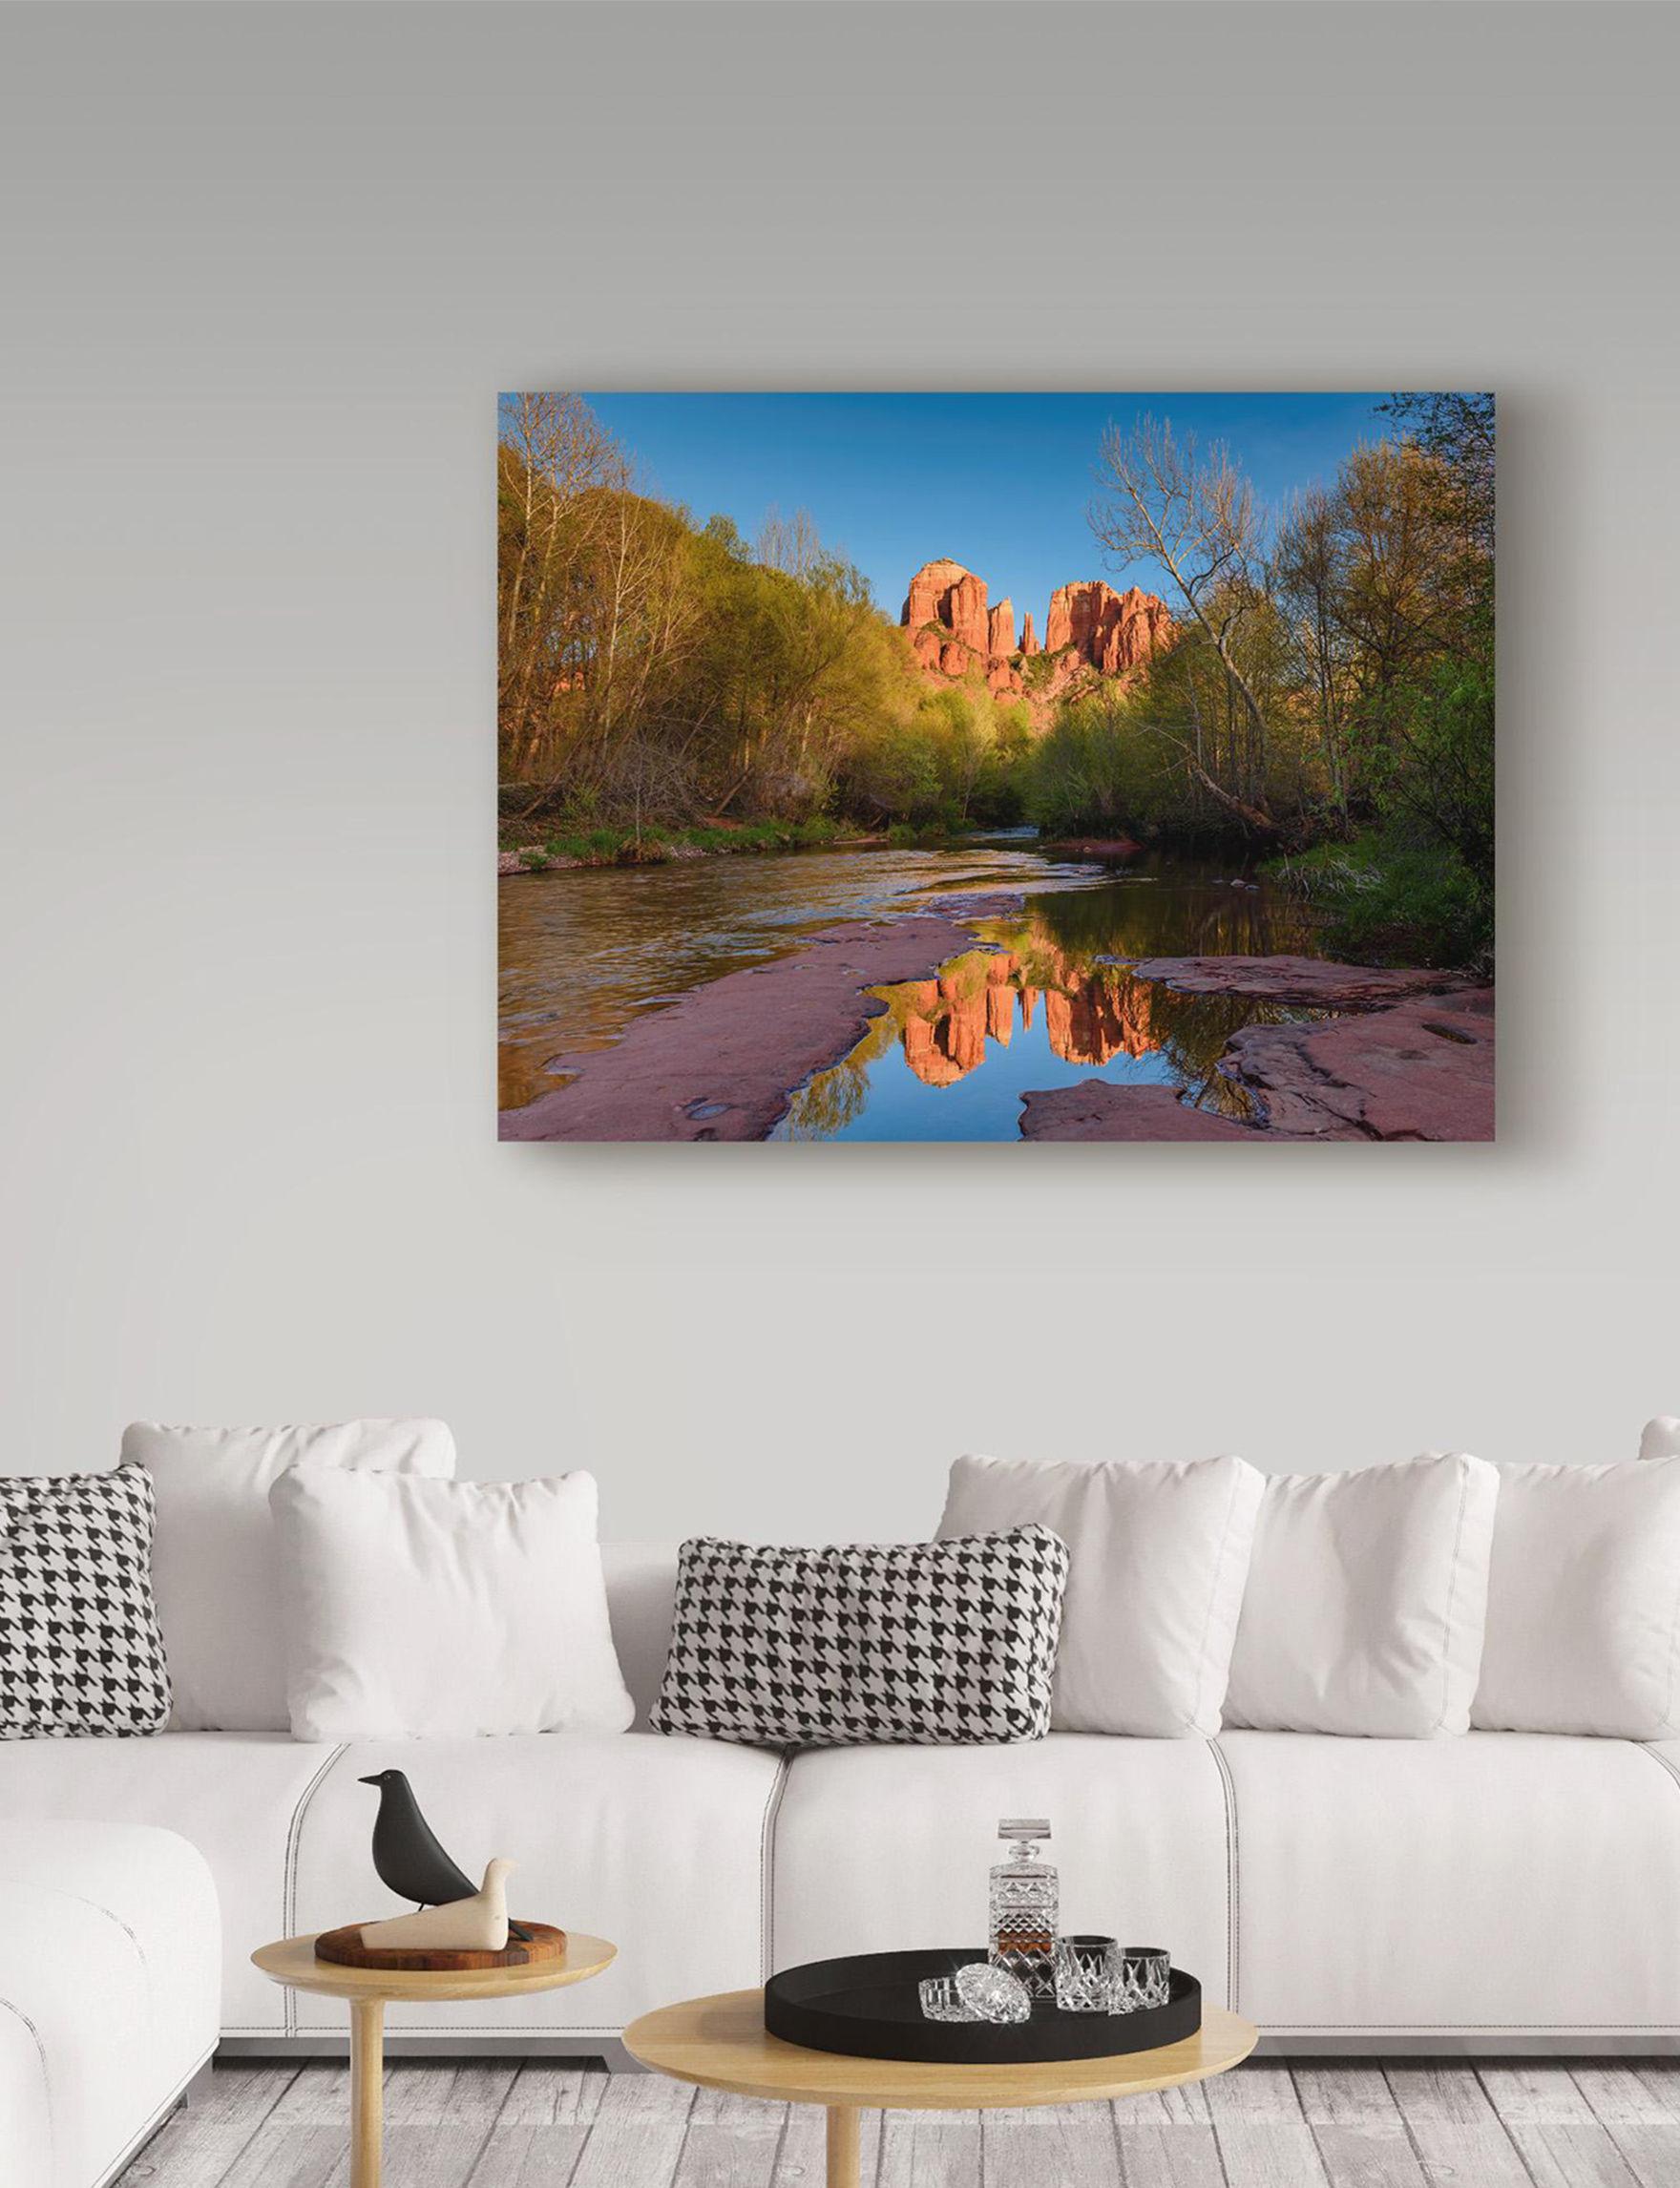 Trademark Fine Art Multi Wall Art Home Accents Wall Decor